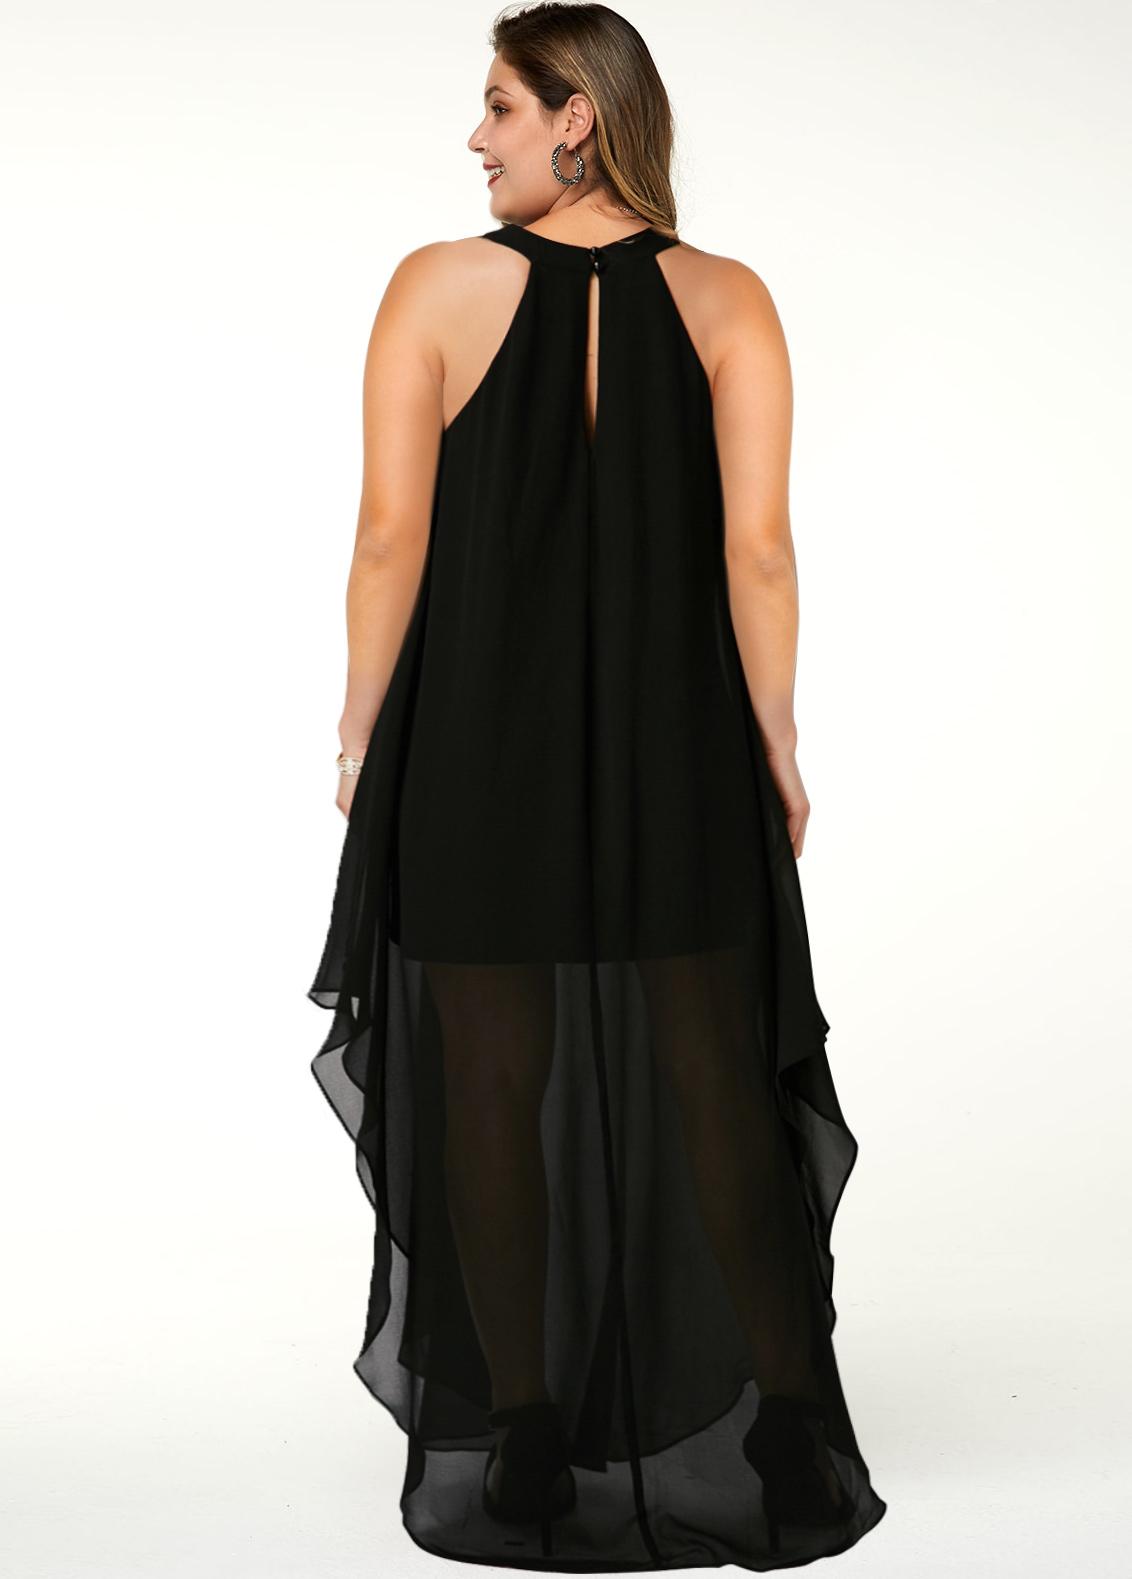 Solid Side Slit Plus Size Dress